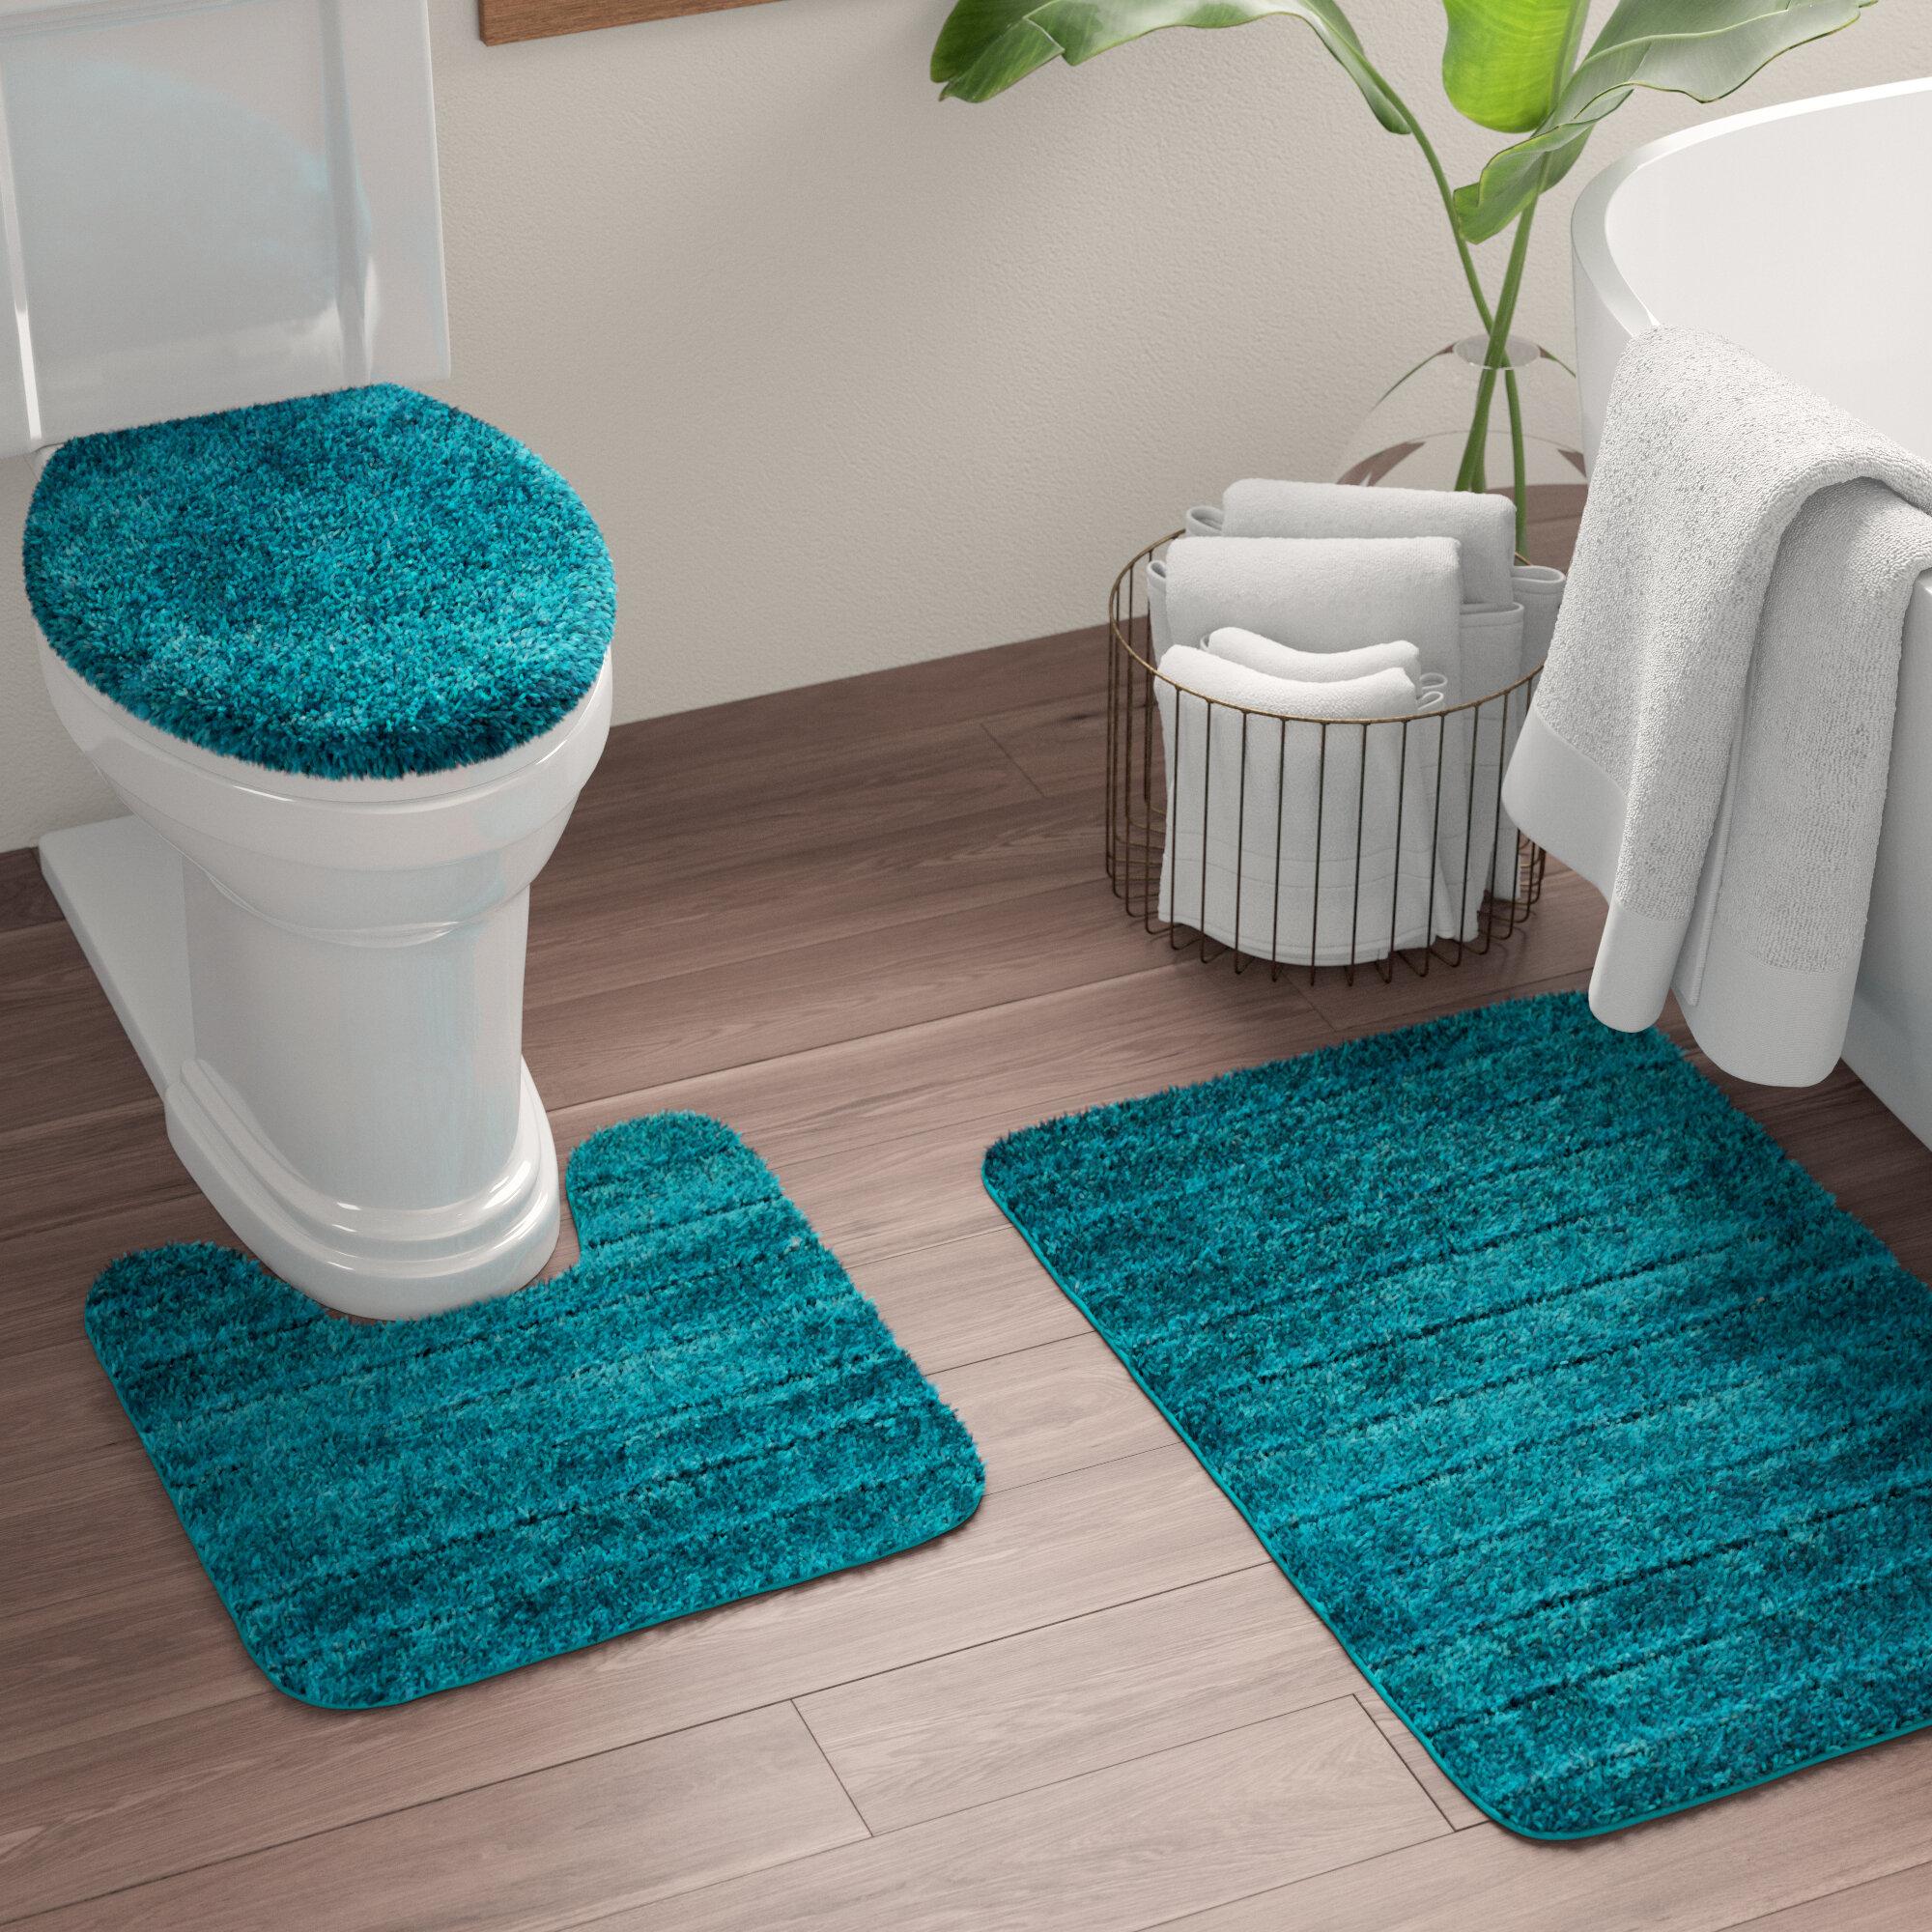 Turquoise Bathroom Set Bath Rugs Mats You Ll Love In 2020 Wayfair